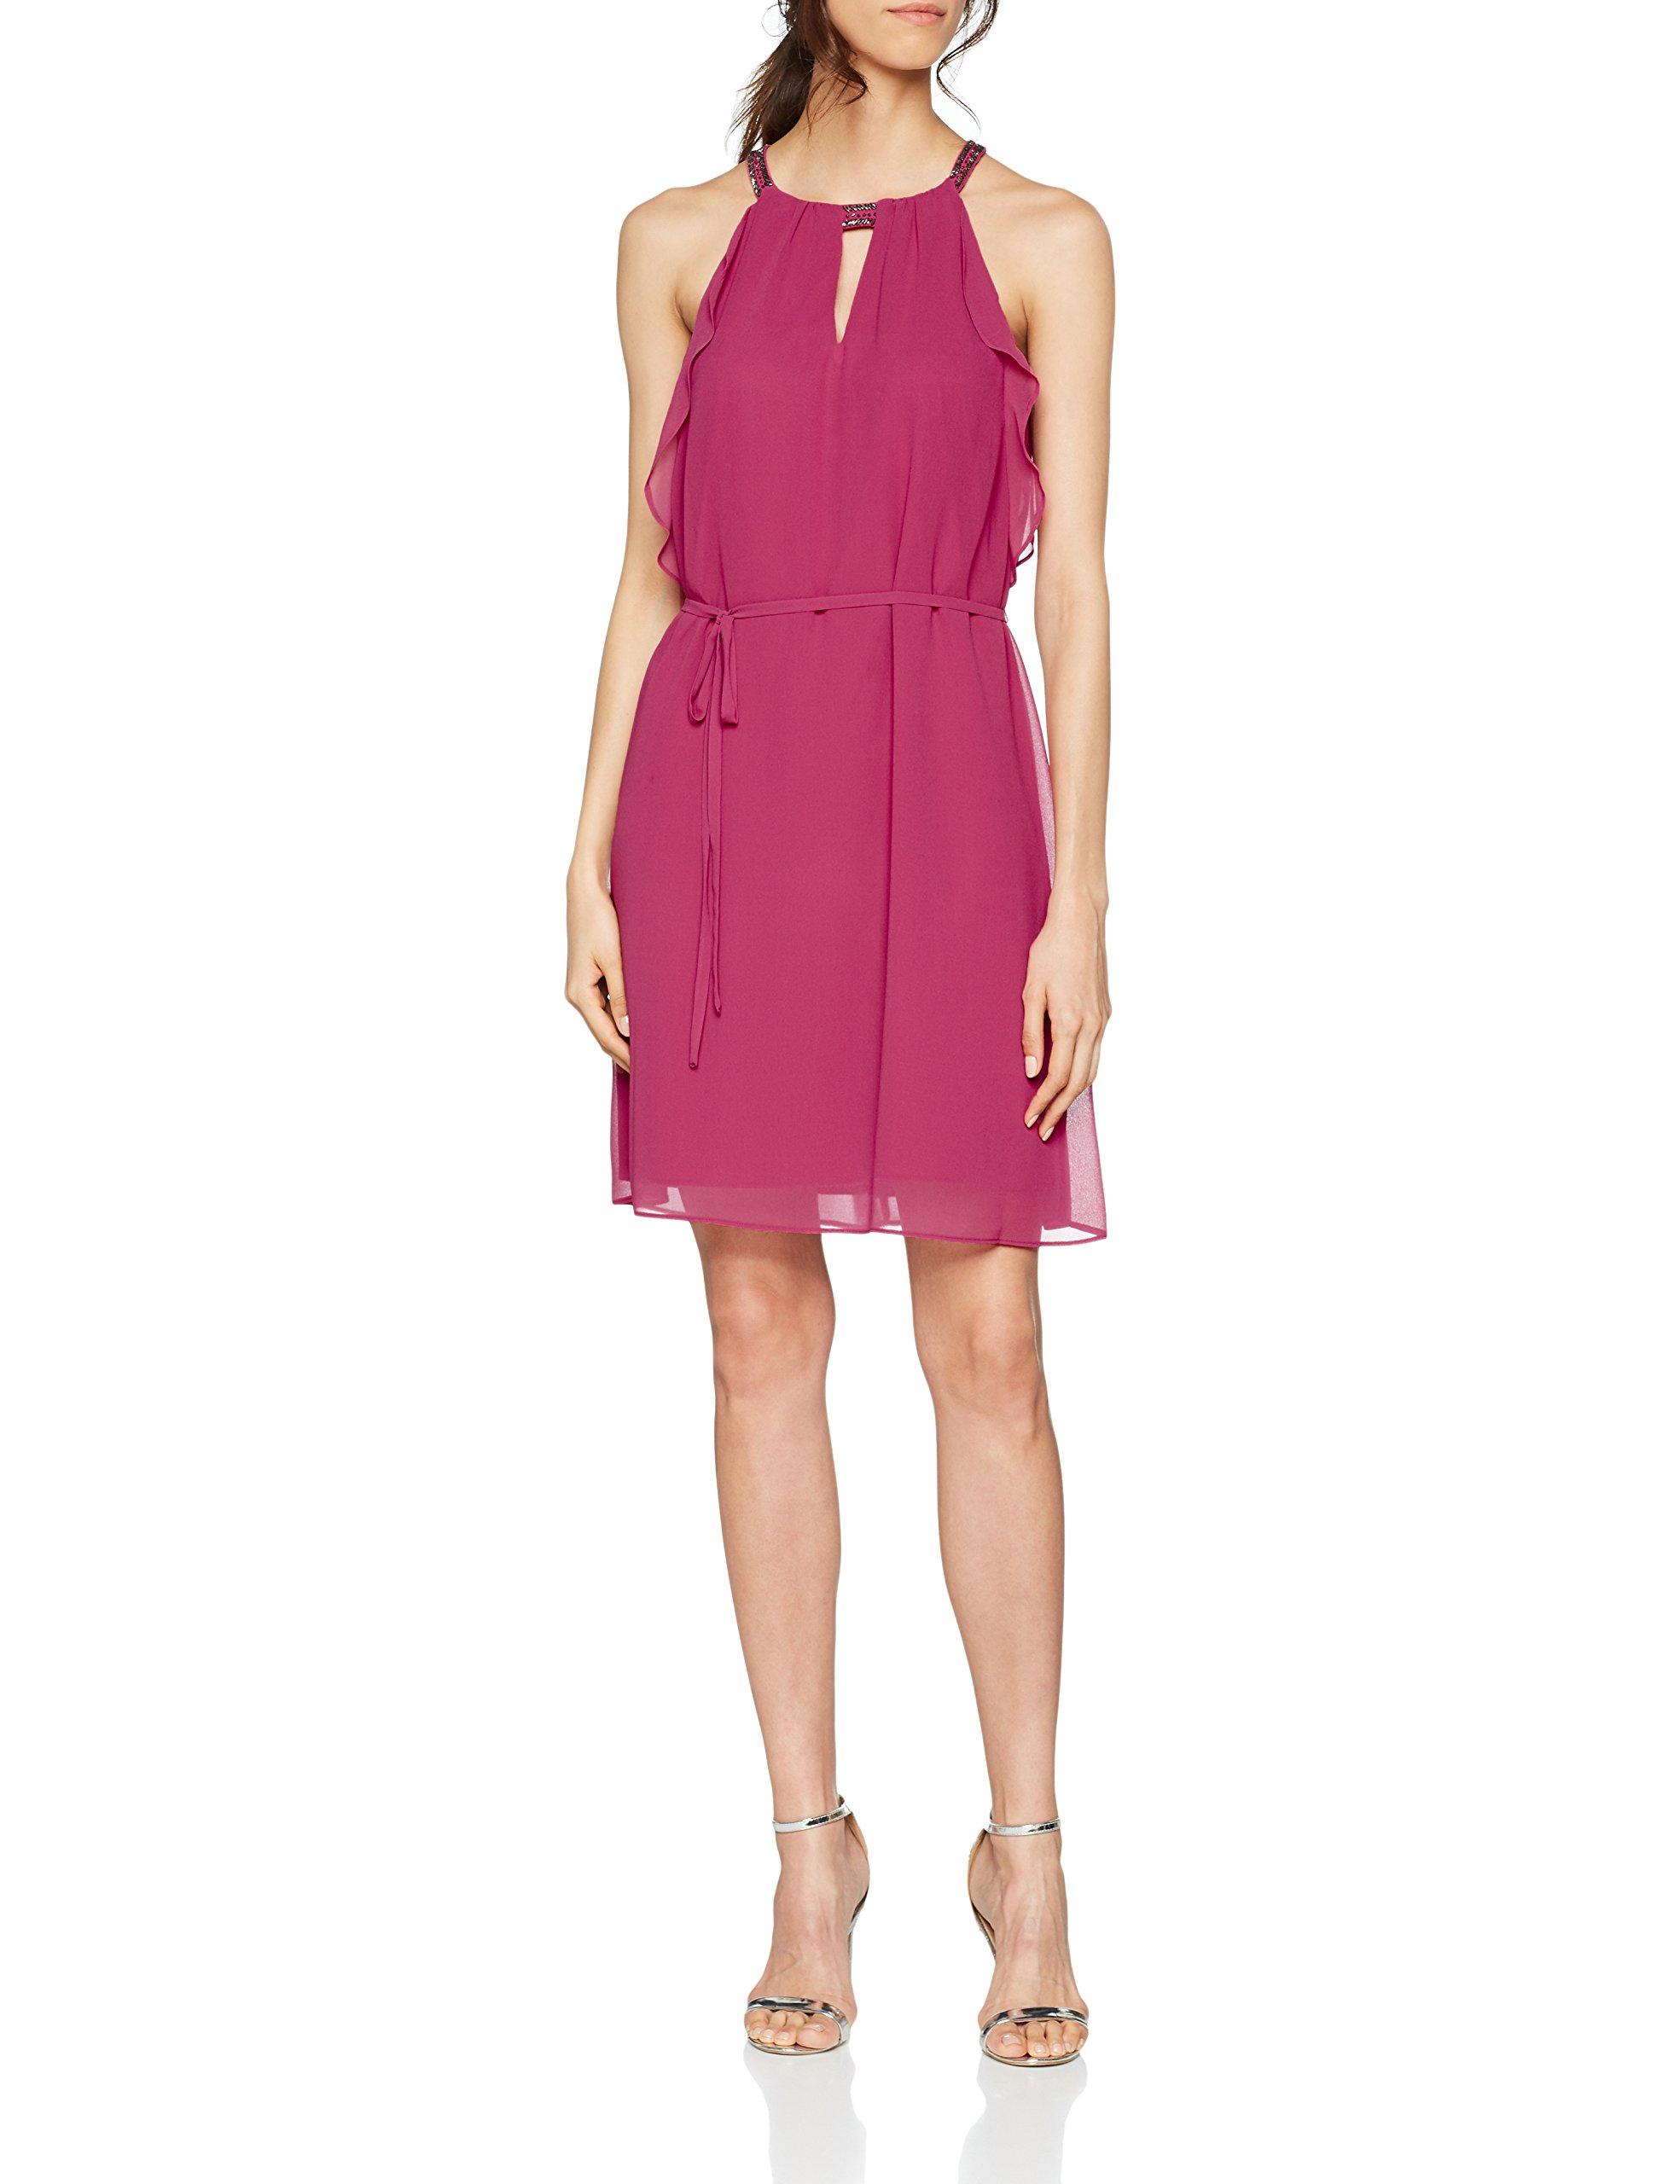 RobeRosedark Collection 048eo1e018 Femme Esprit 65042 Pink b6ygf7Y